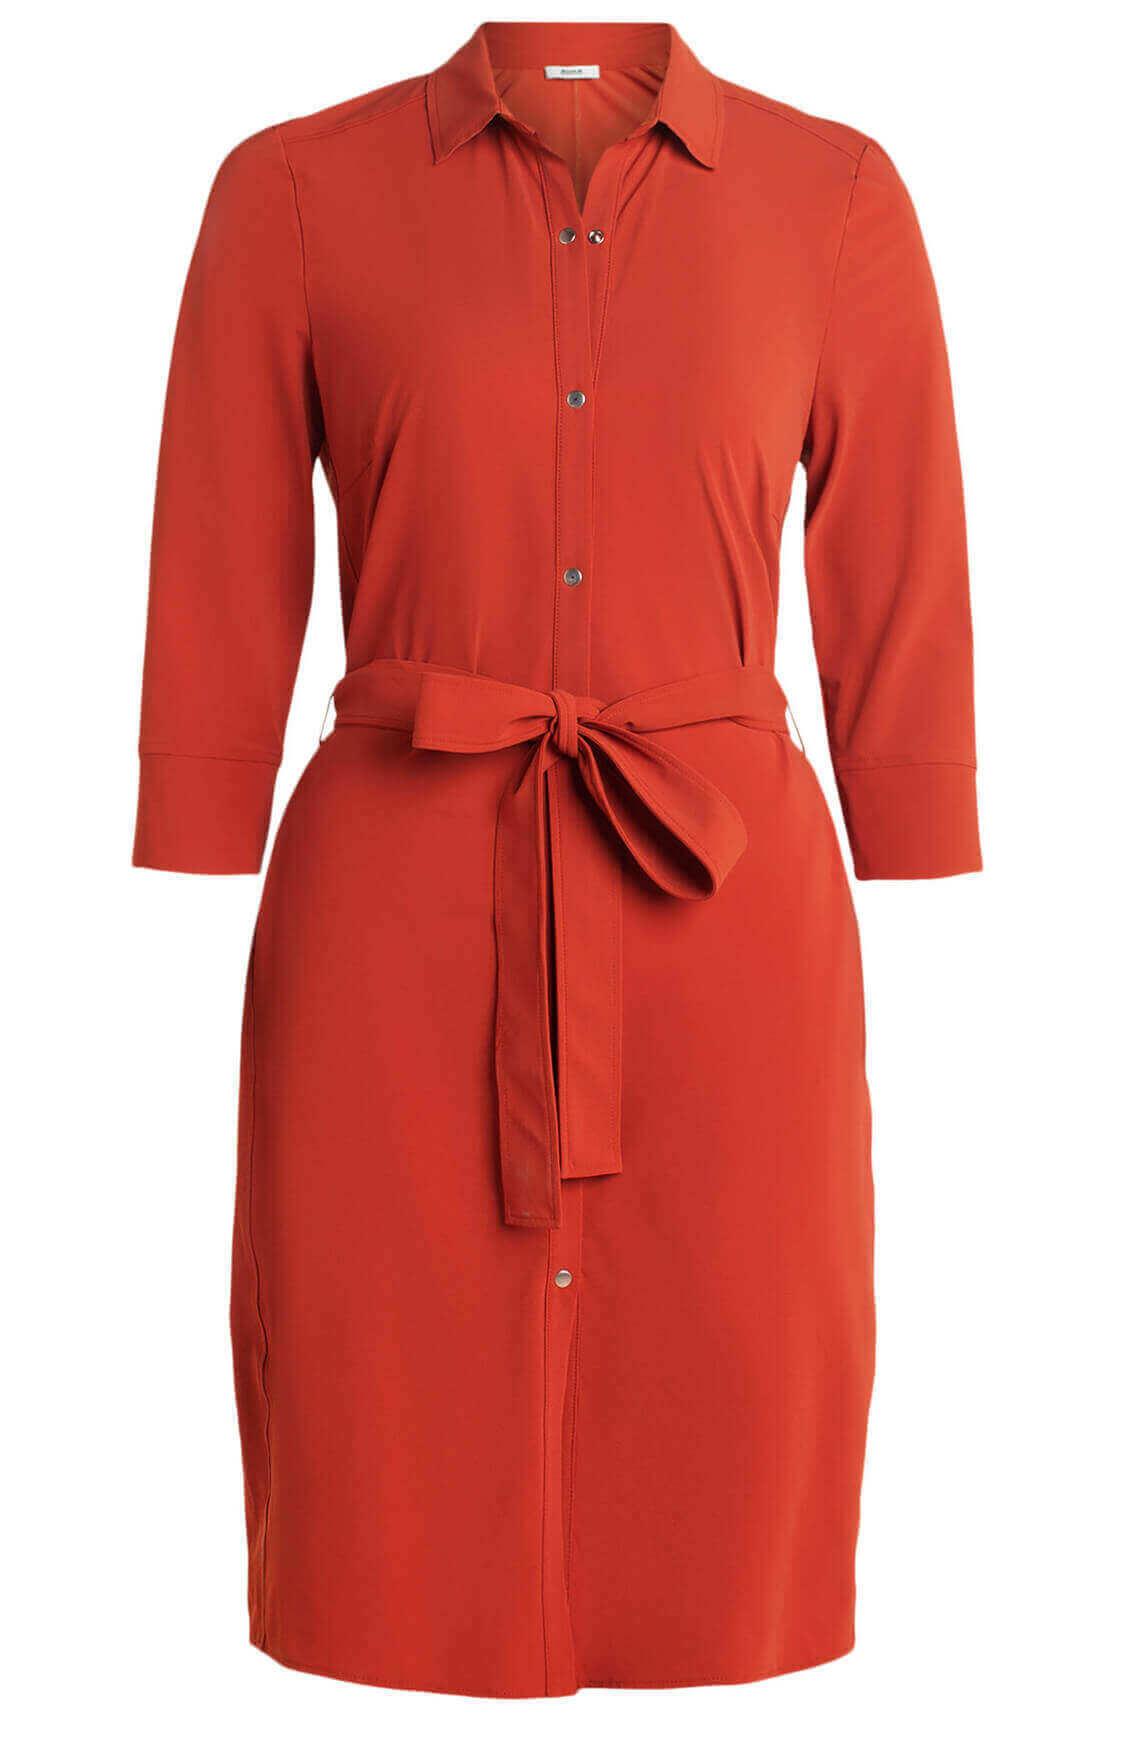 Anna Dames Eurojersey jurk met ceintuur Rood